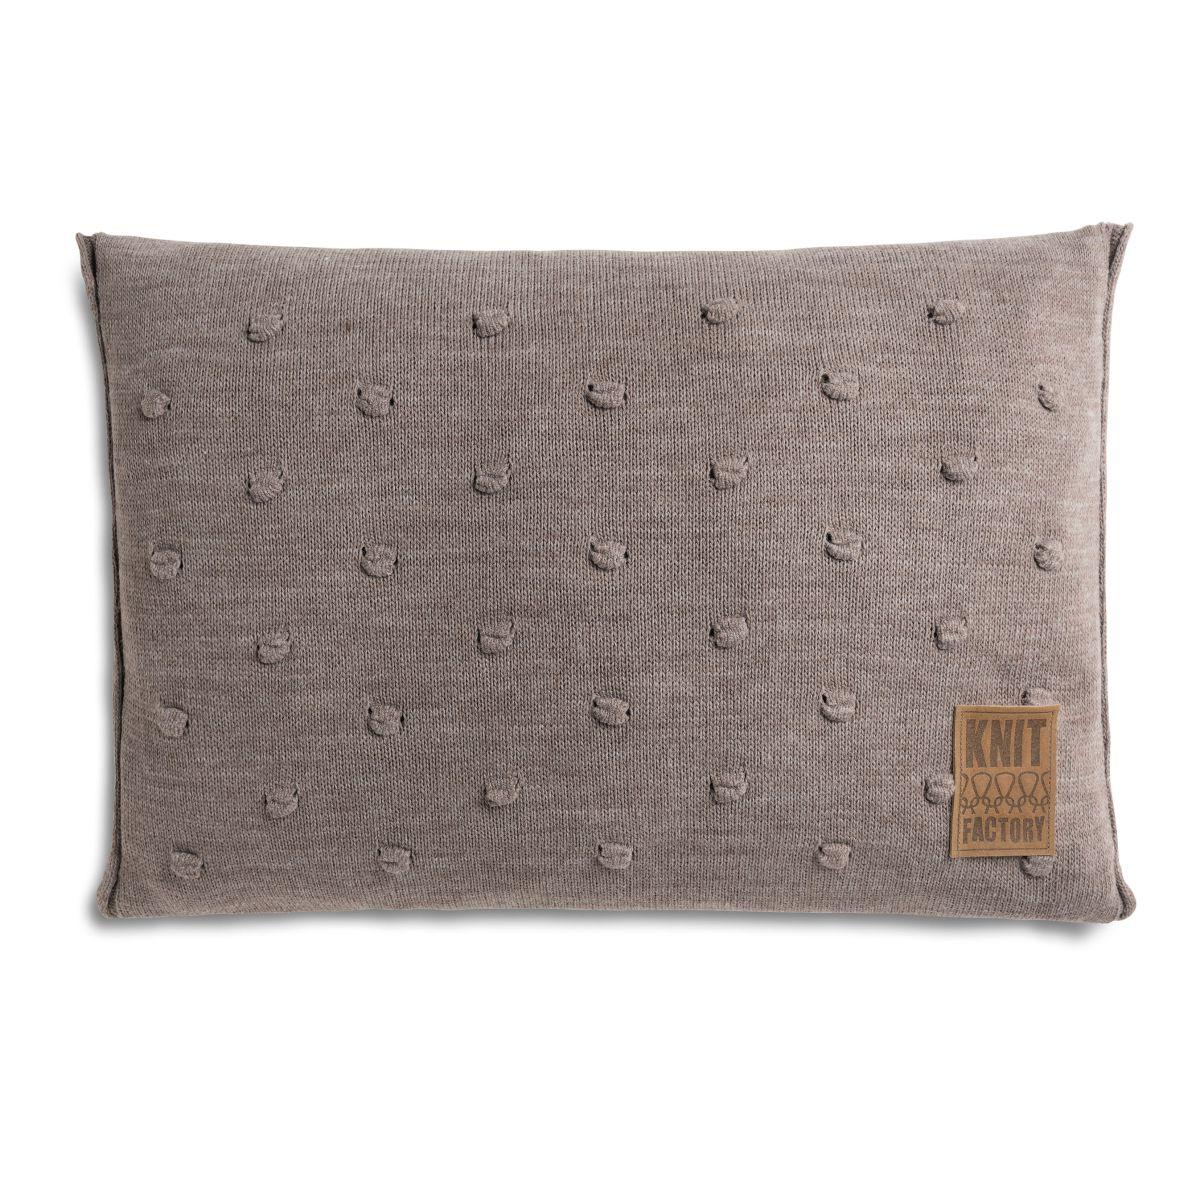 knit factory 1071329 kussen 60x40 noa taupe 1